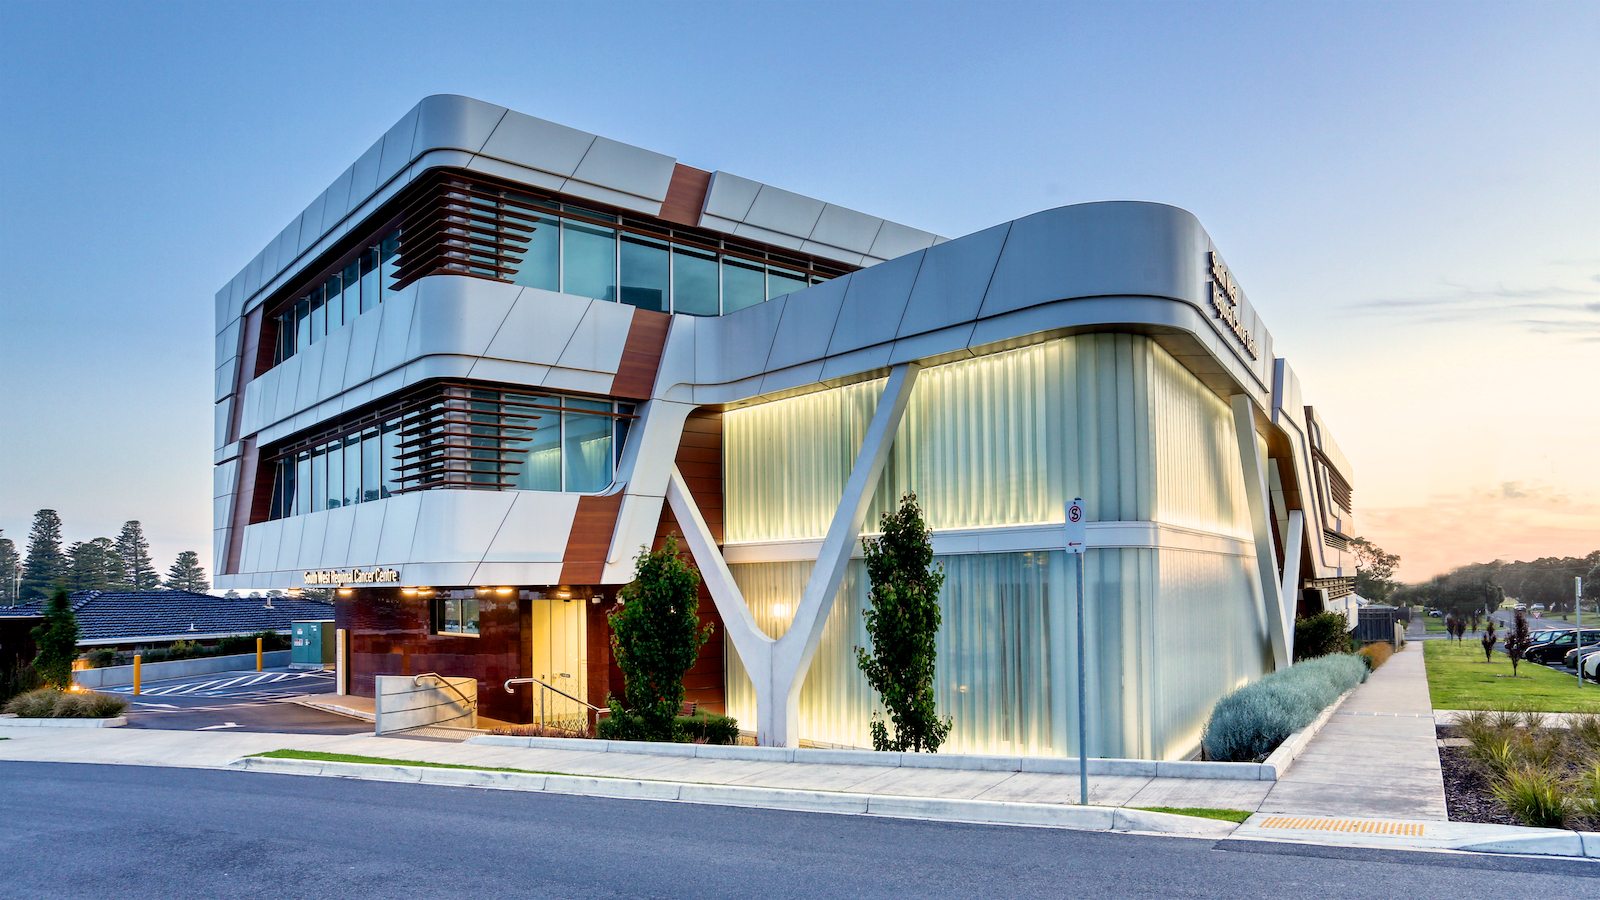 South West Regional Cancer Centre, Warrnambool